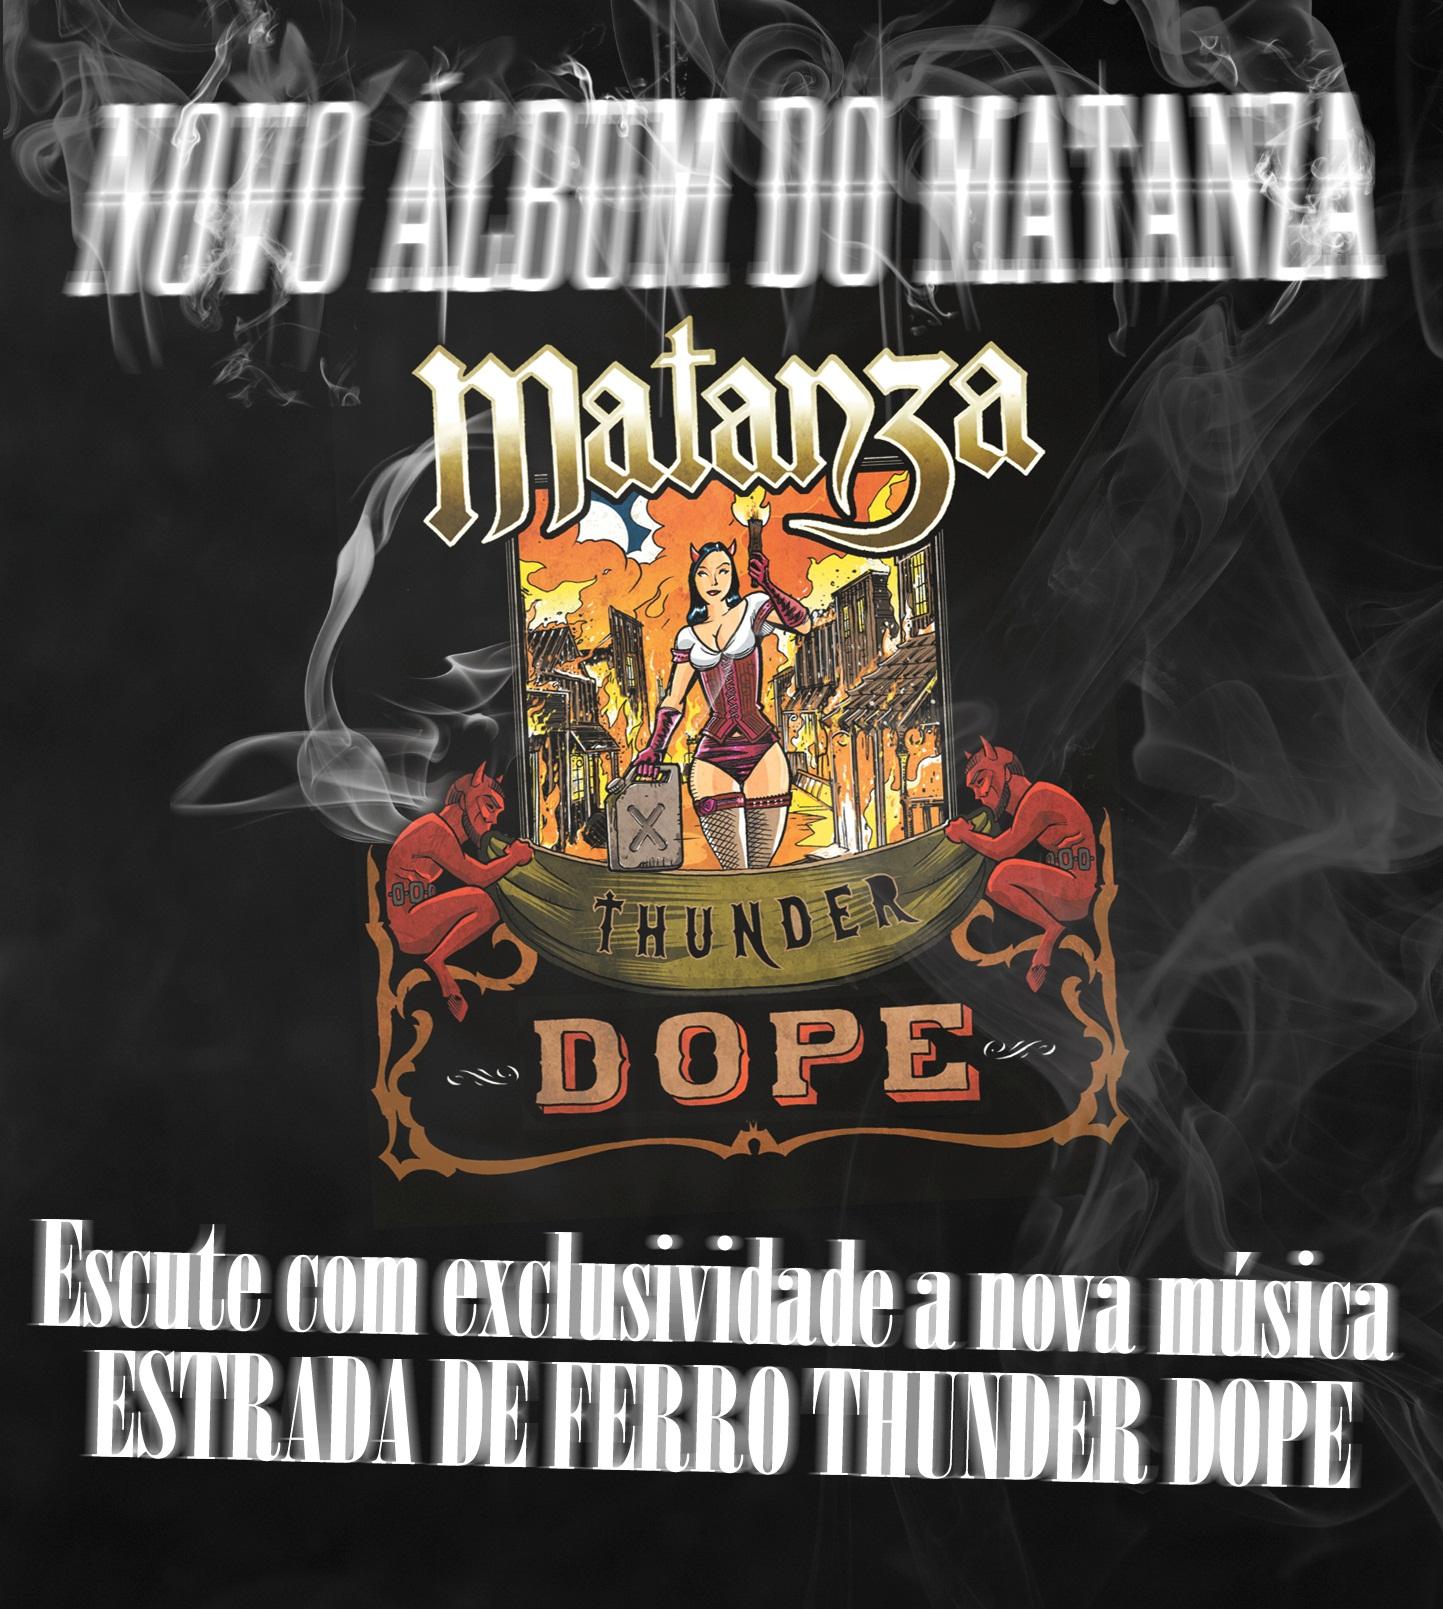 Matanza - Estrada De Ferro Thunder Dope